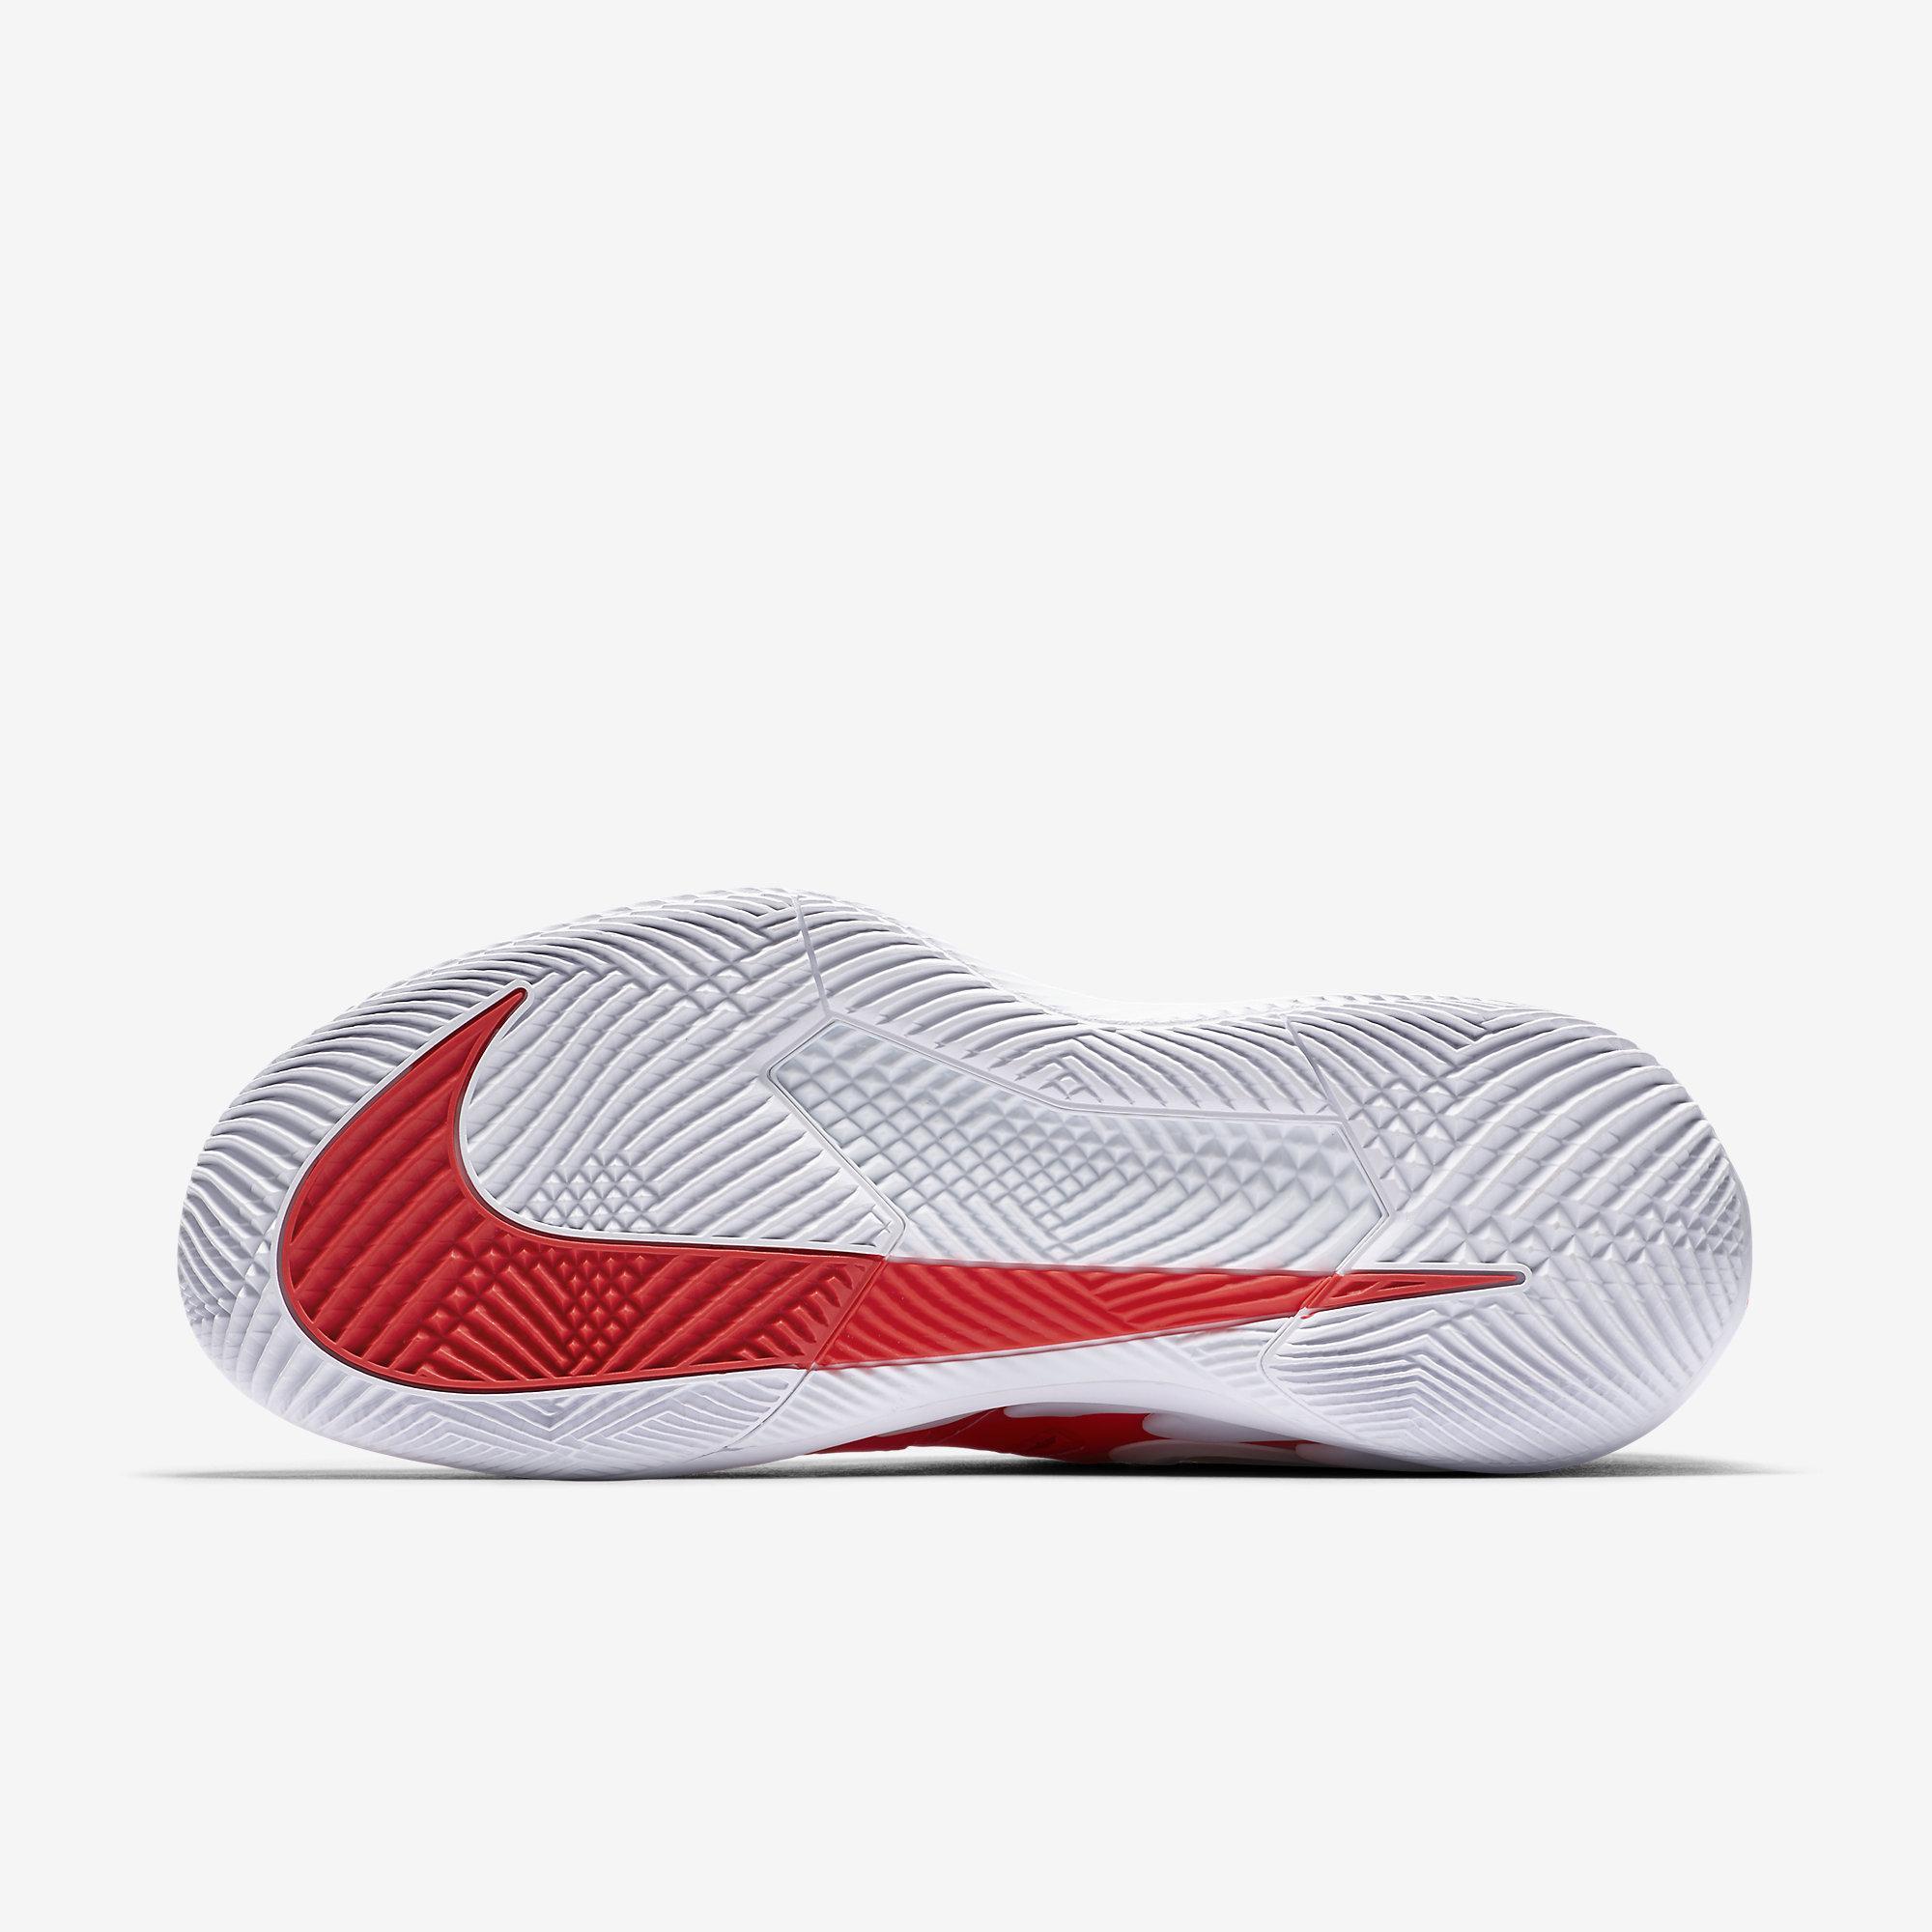 detailing e2203 9185f Nike Mens Air Zoom Vapor X Tennis Shoes - Bright Crimson Blackened Blue